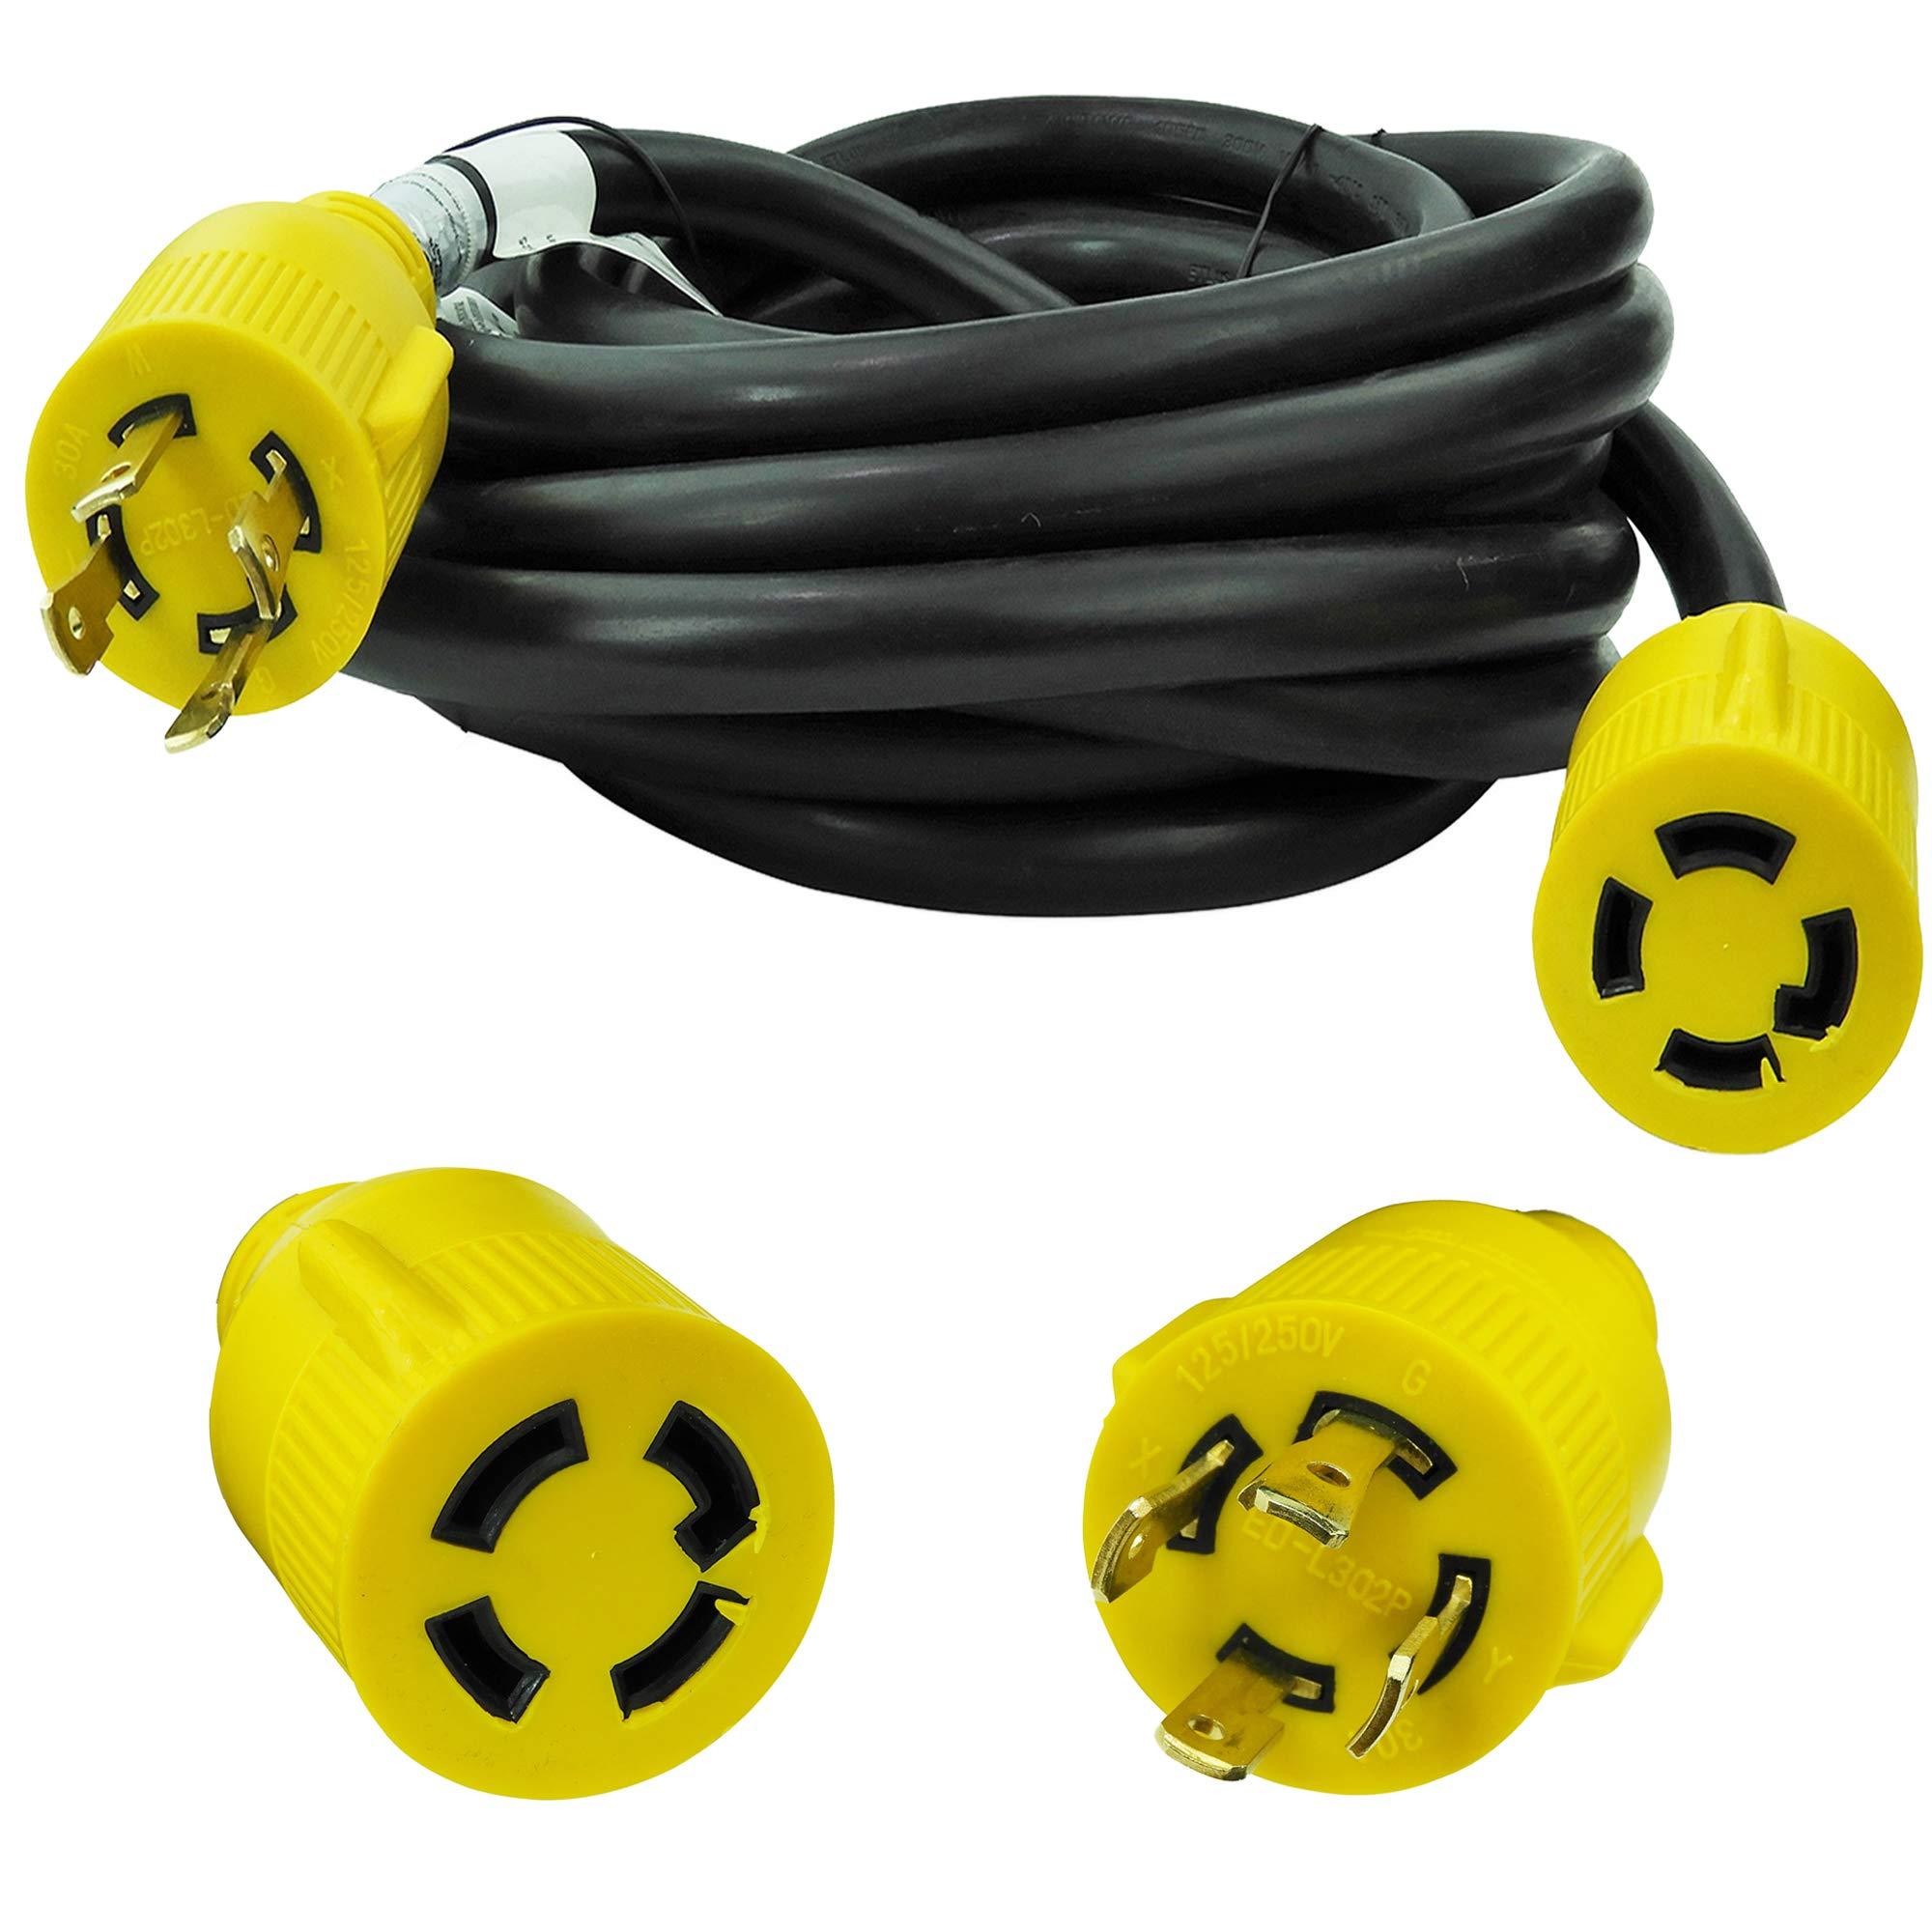 Leisure Cords 4-Prong 25 Feet 30 Amp Generator Cord, 10 Gauge Heavy Duty L14-30 Generator Power Cord Up to 7,500W (25-Feet)